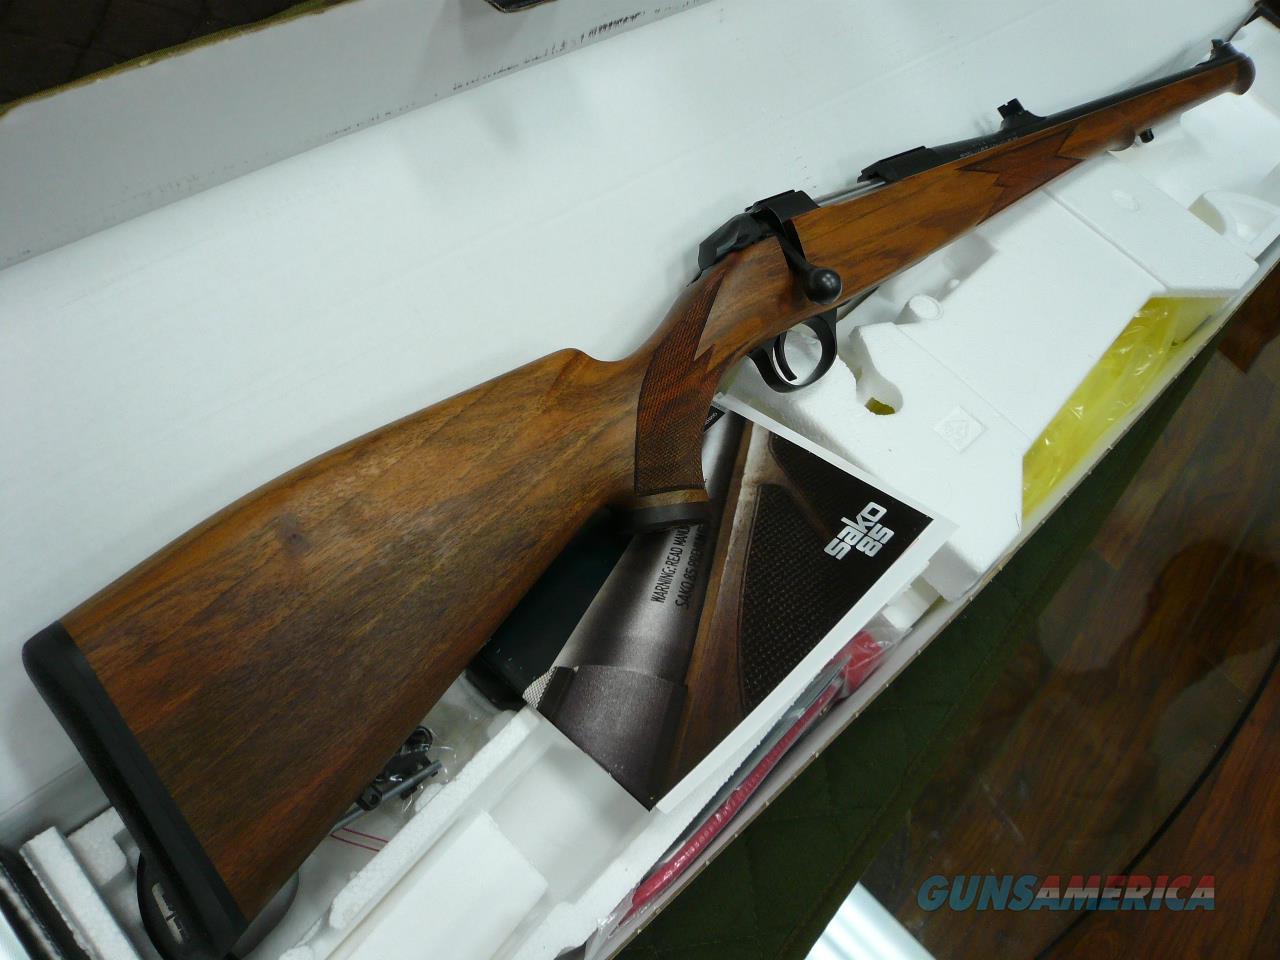 """WINTER SALES"" M85 BAVARIAN CABINE  20"" 260Rem(European Market Model)NIB  Guns > Rifles > Sako Rifles > M85 Series"